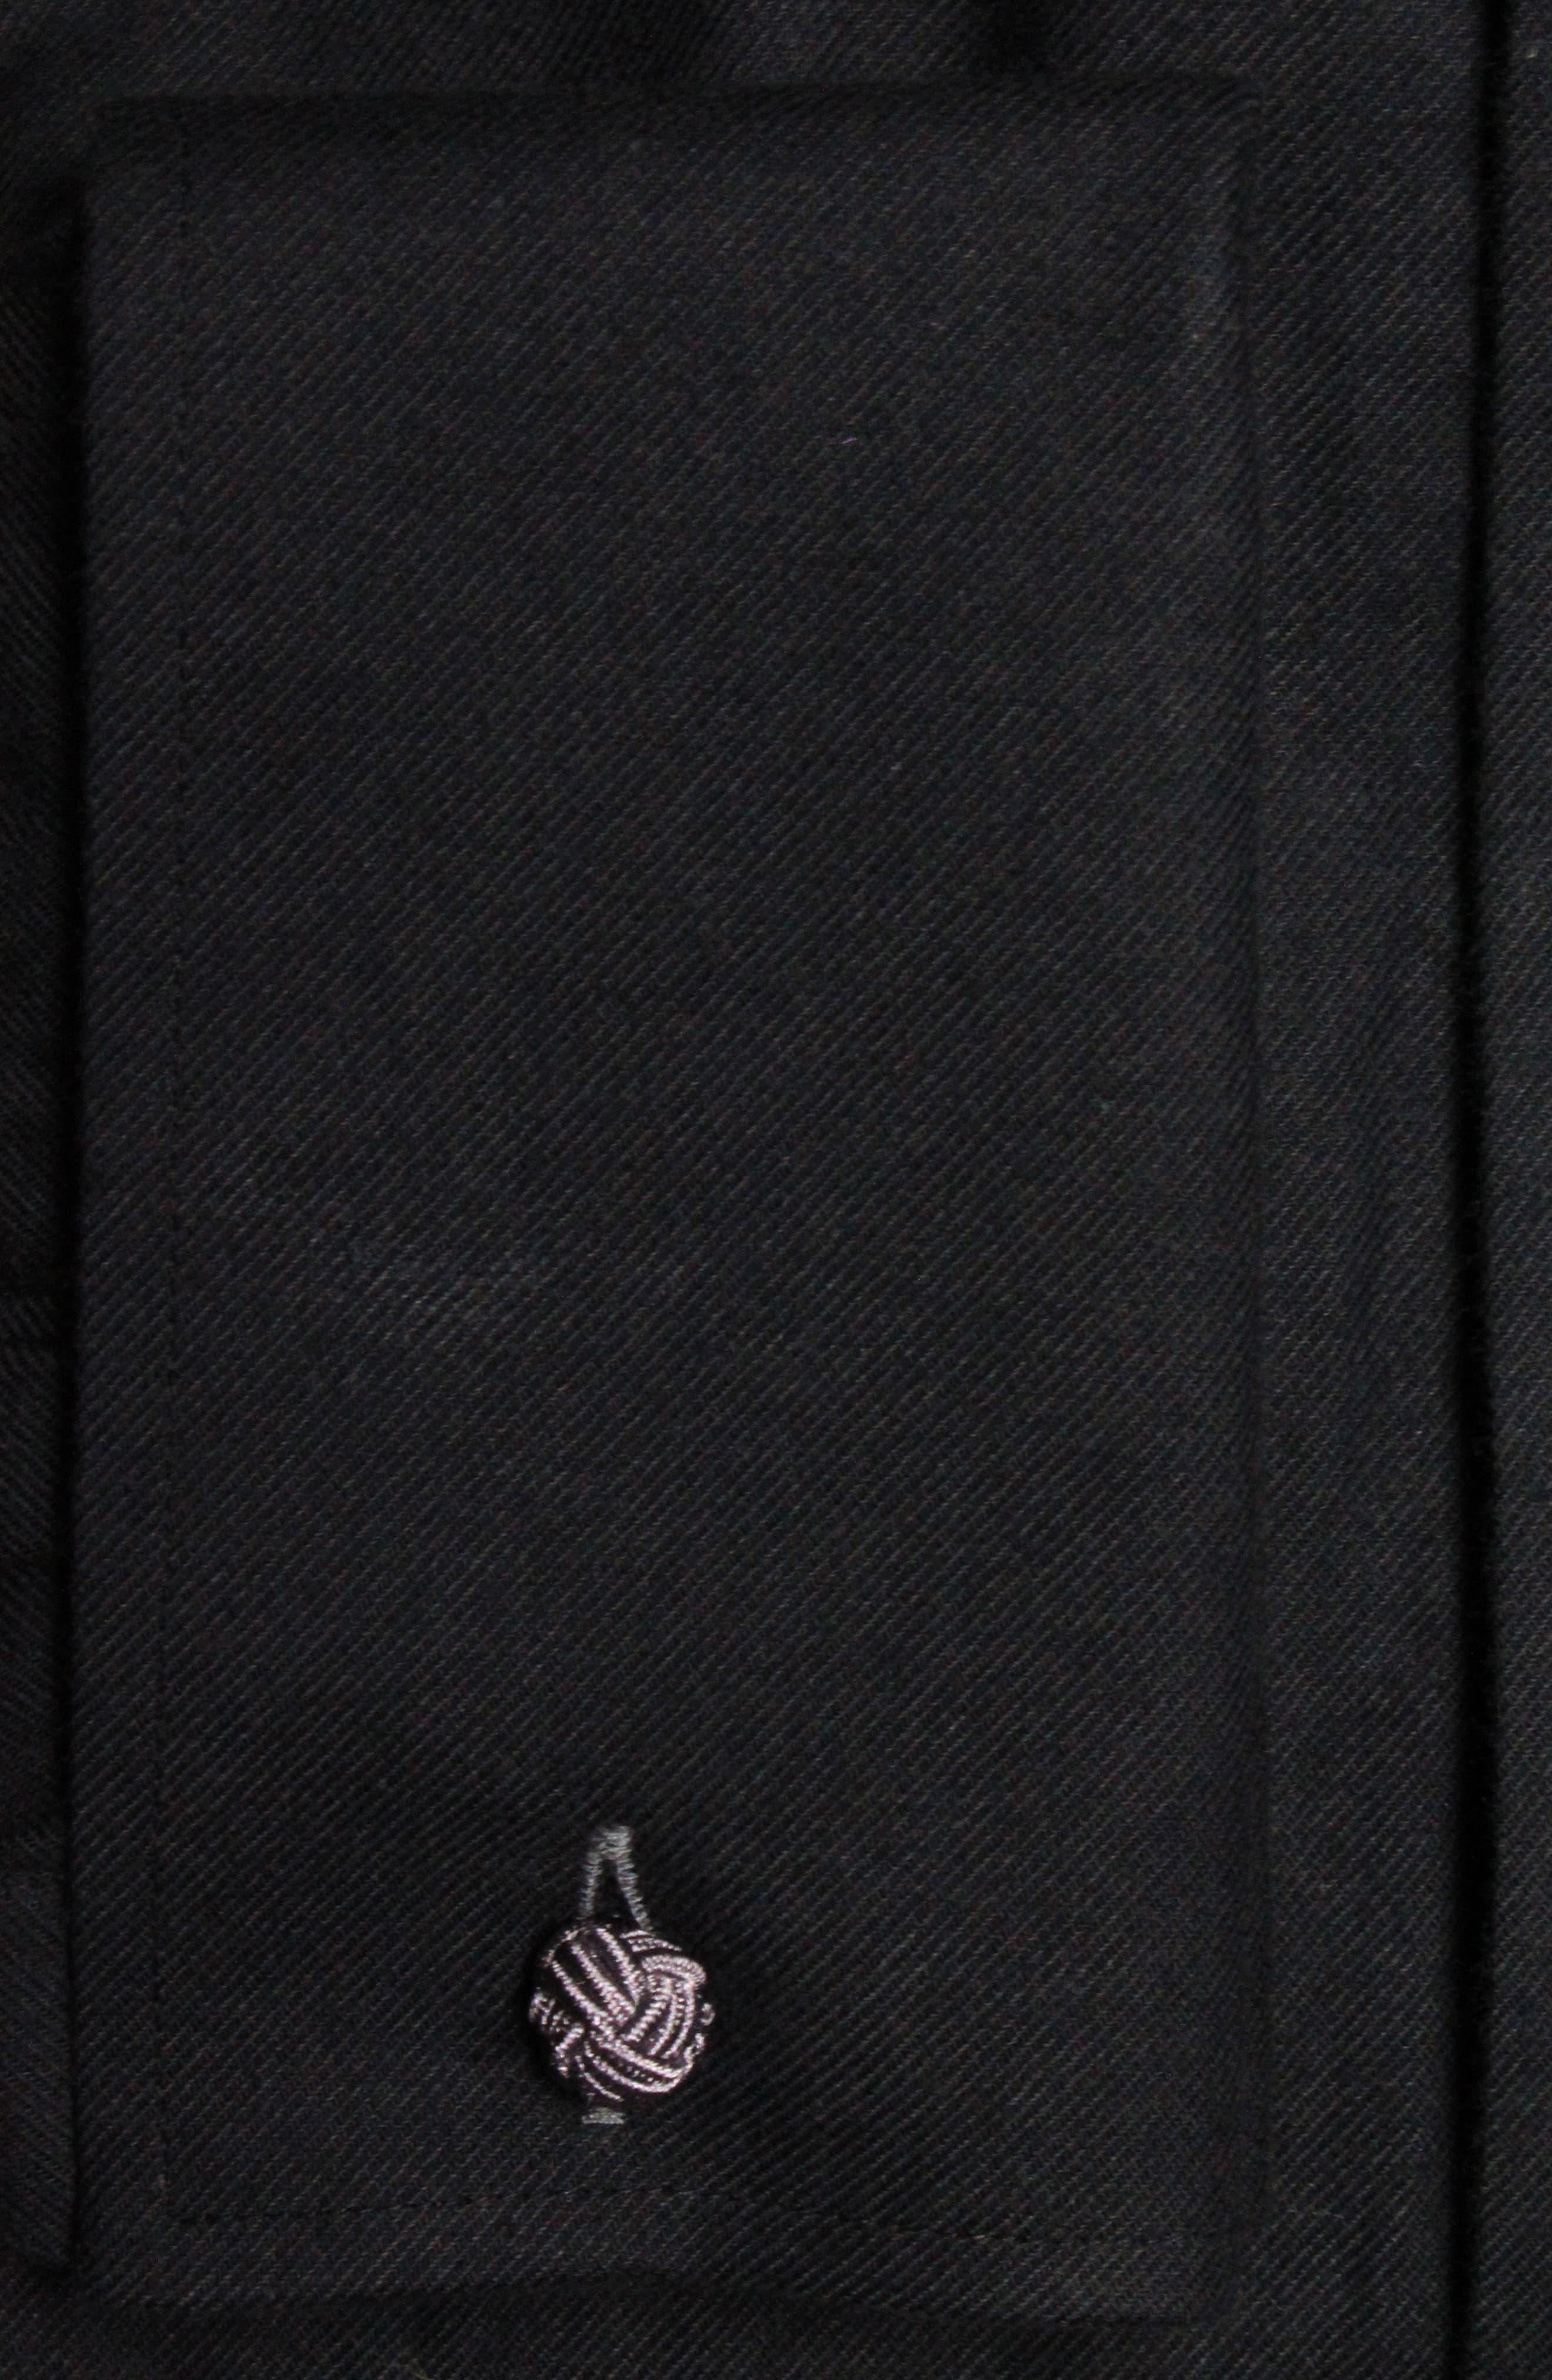 Alternate Image 2  - Lorenzo Uomo Trim Fit Tuxedo Shirt